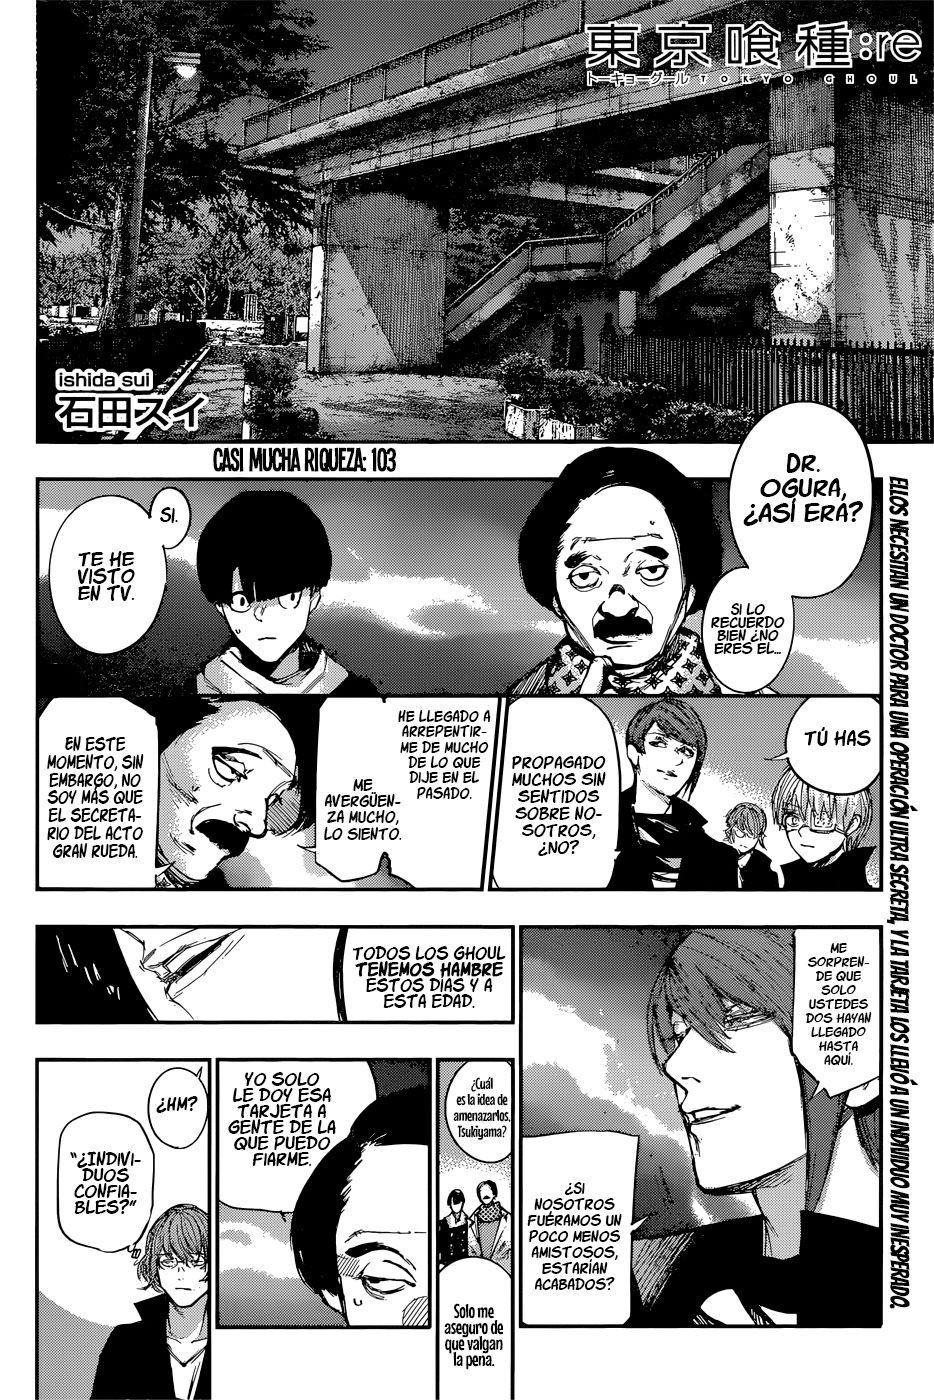 http://c5.ninemanga.com/es_manga/pic2/59/59/523533/252a3893179658de41f437d975468205.jpg Page 3